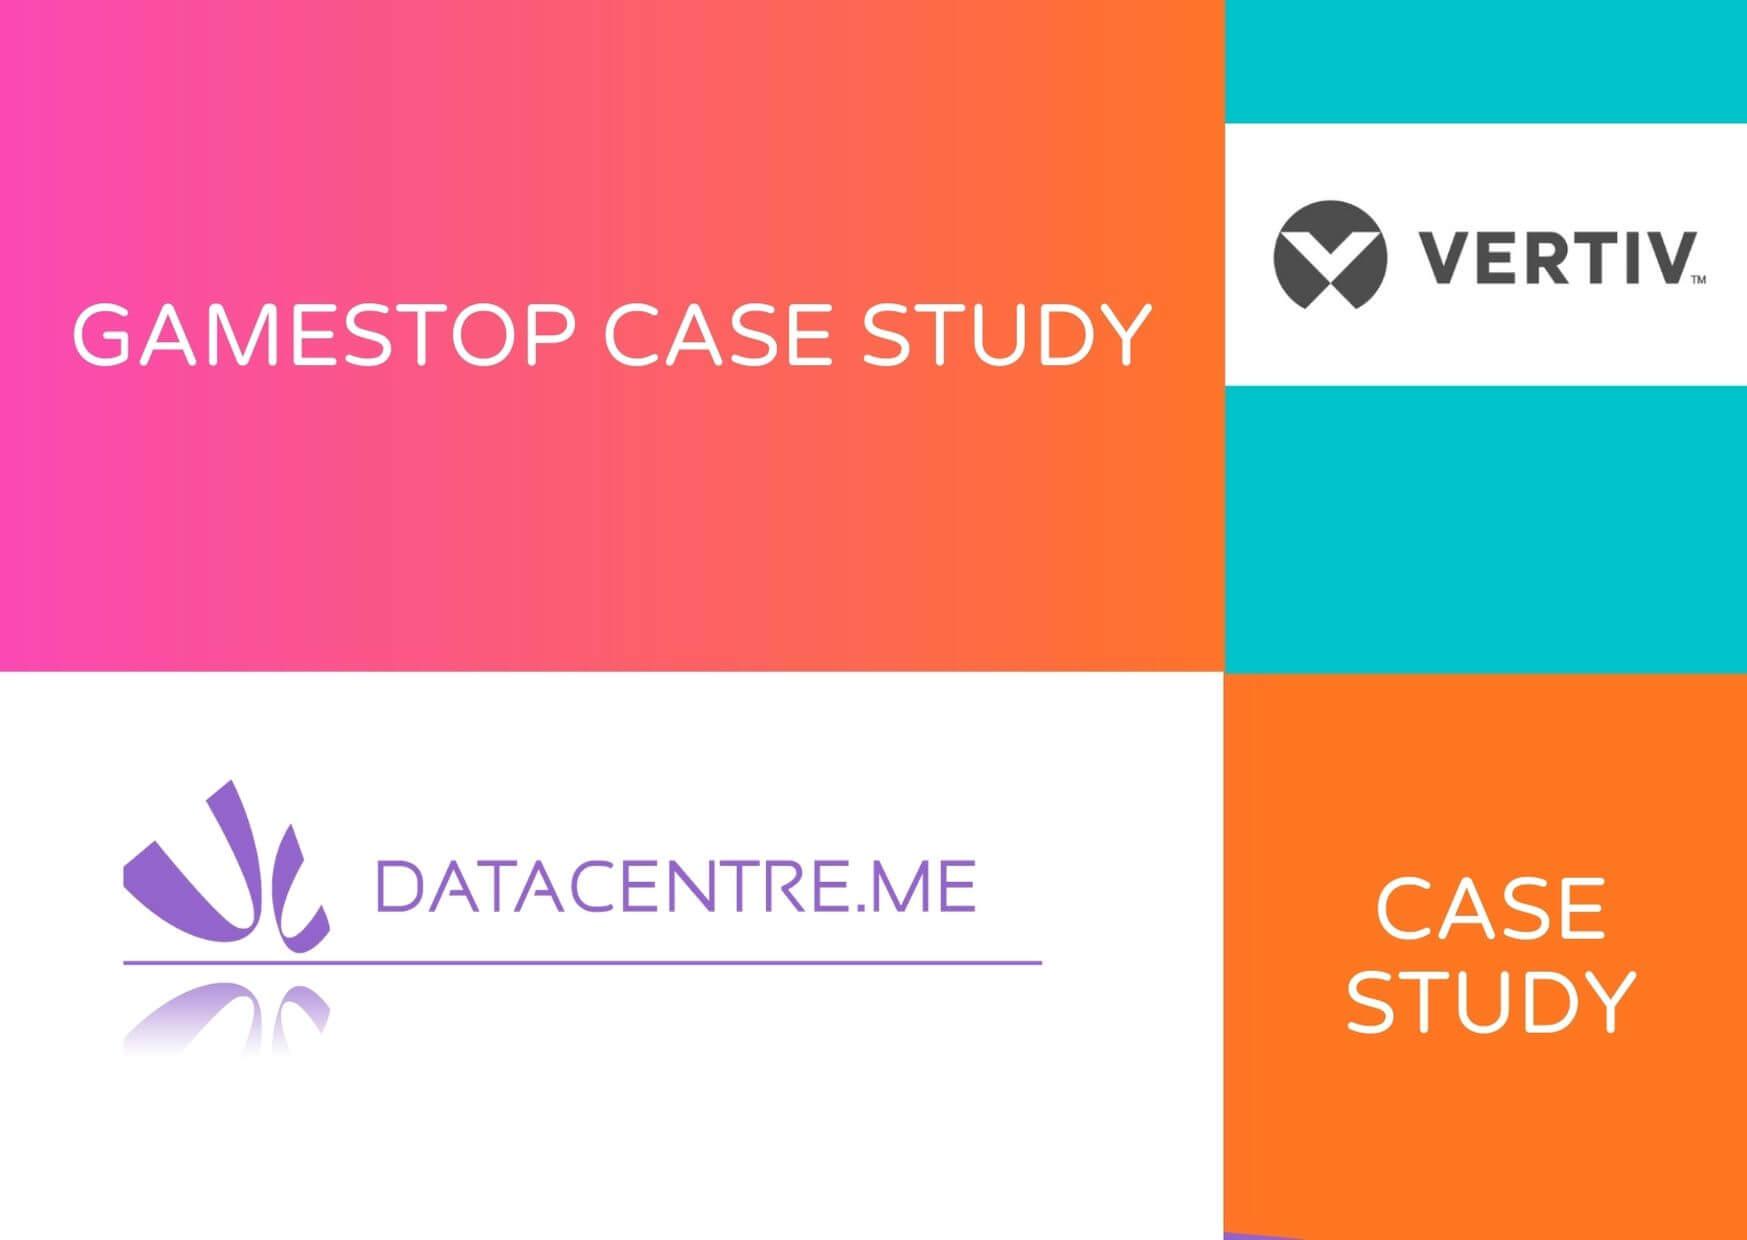 GameStop Case Study from Vertiv